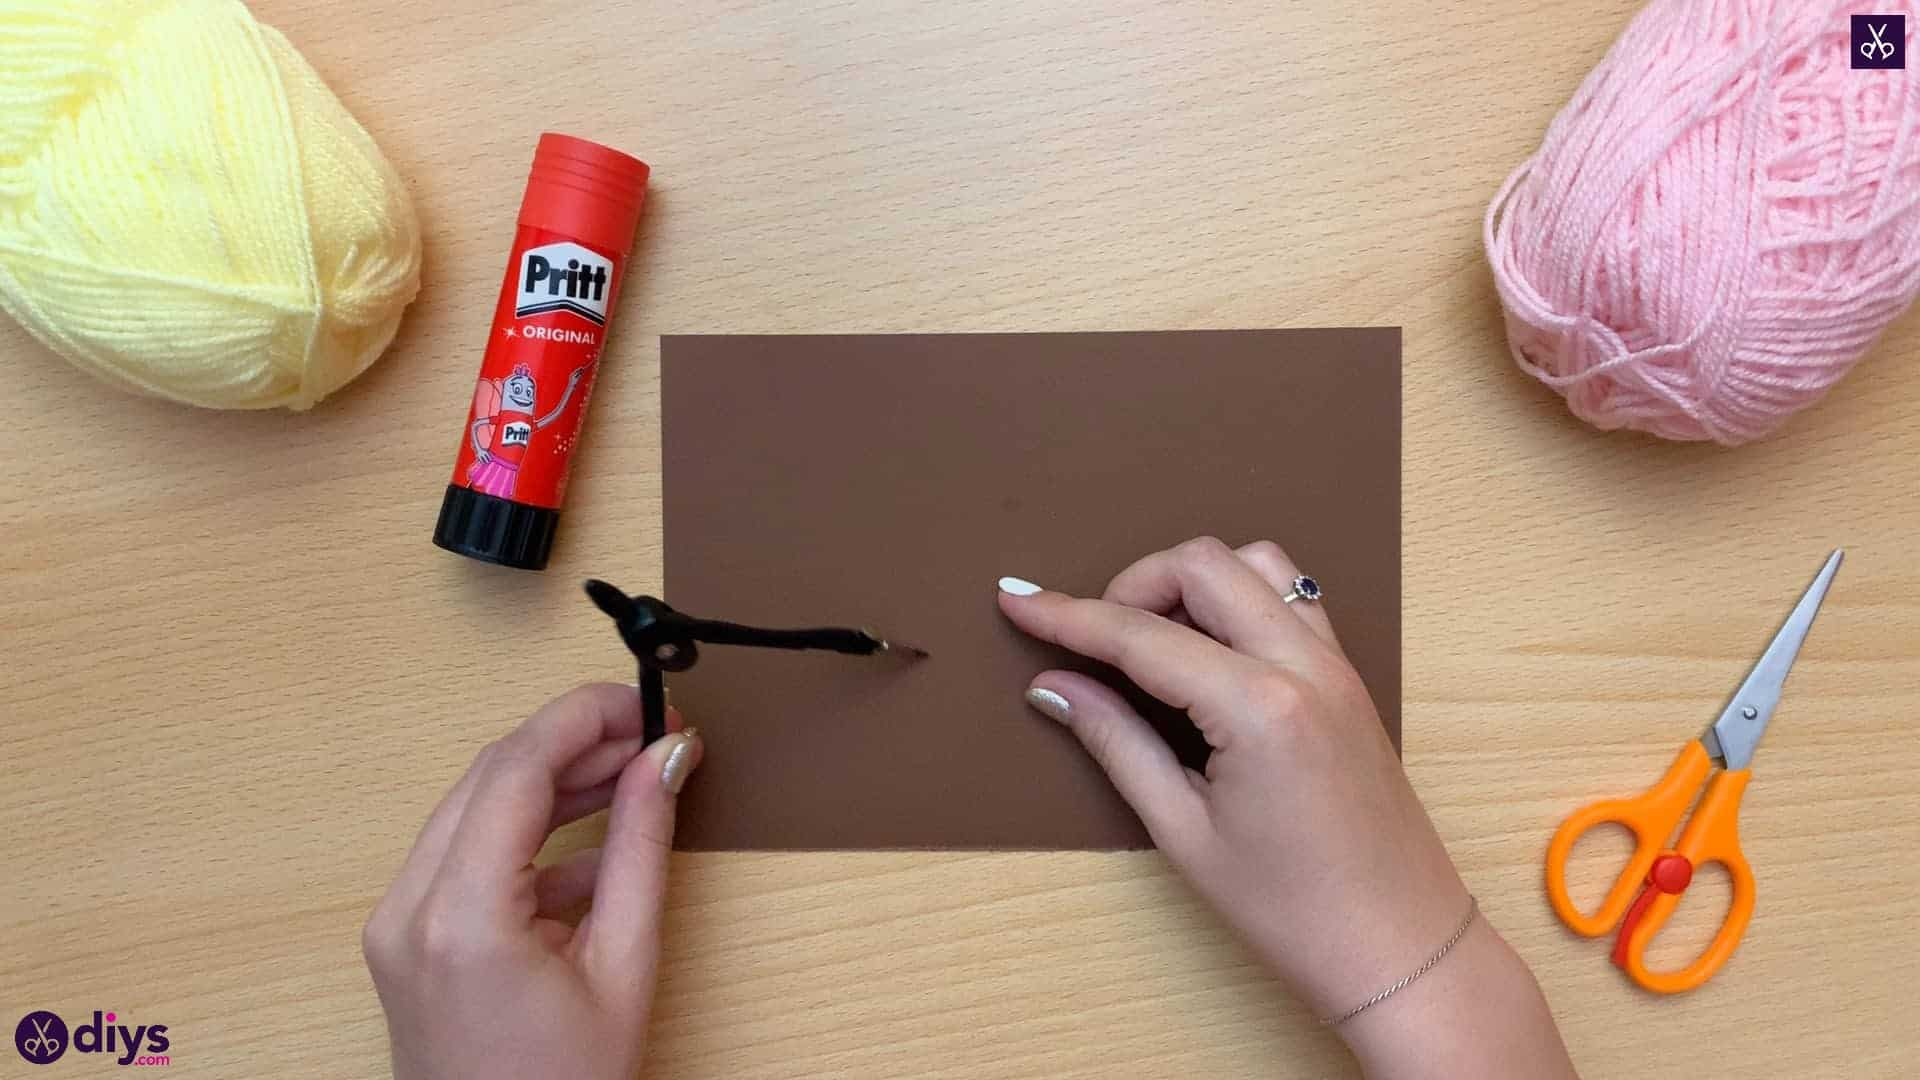 How to make an ice cream pom pom draw